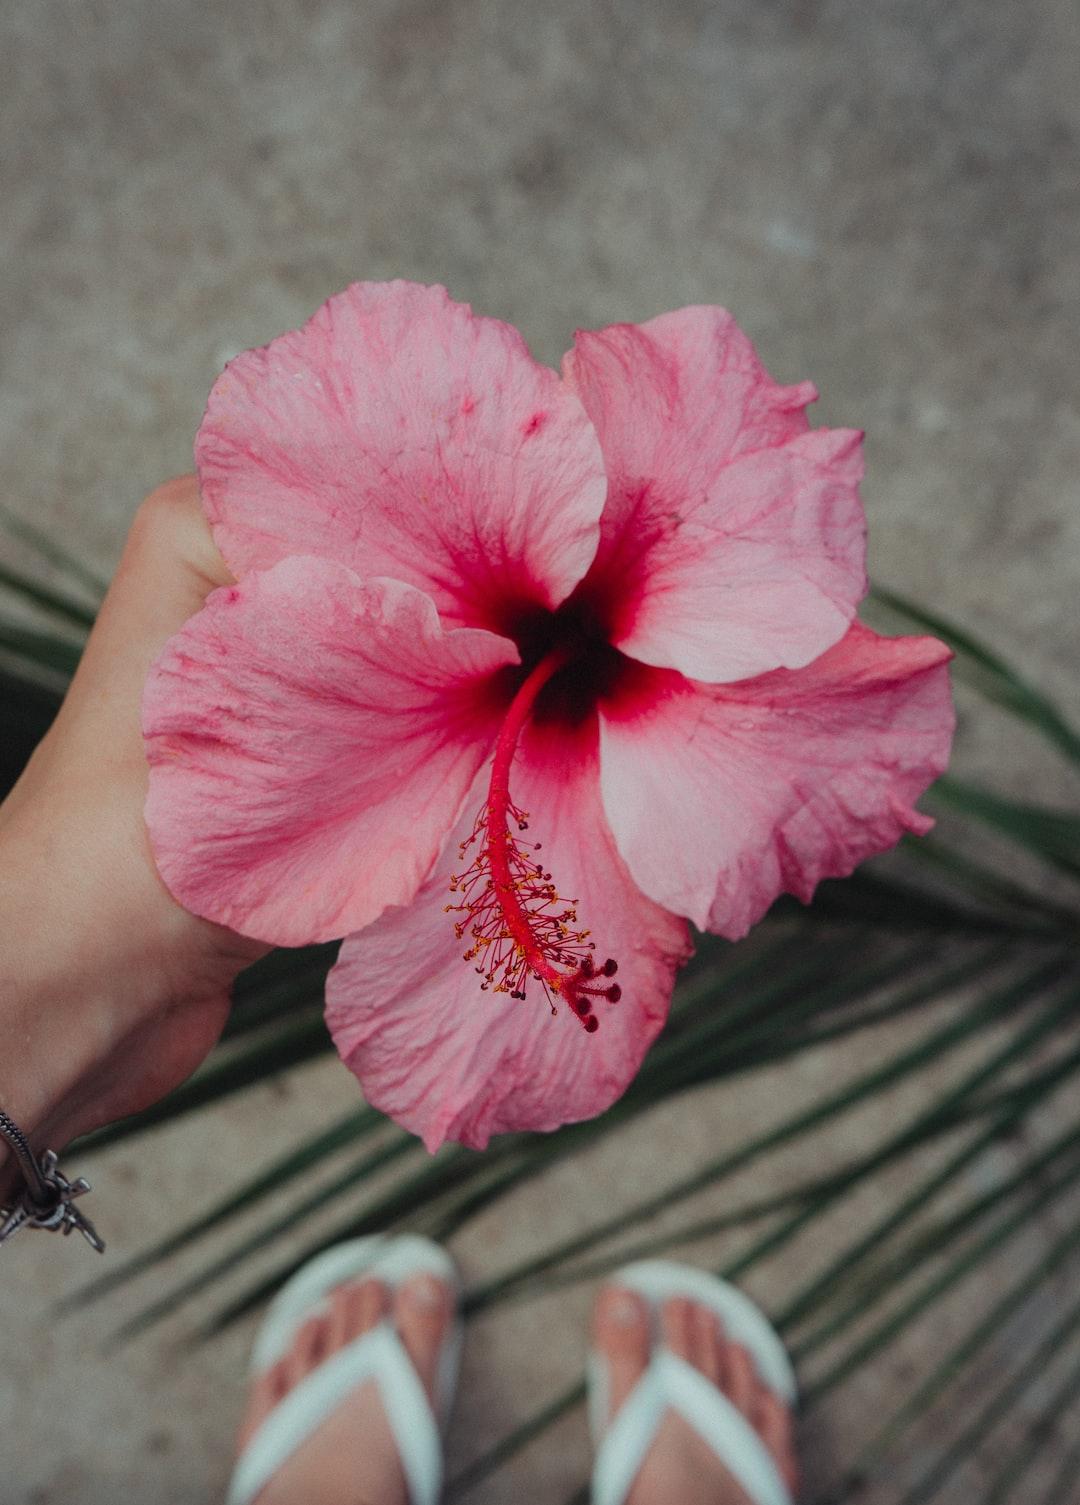 Girl holding hibiscus flower